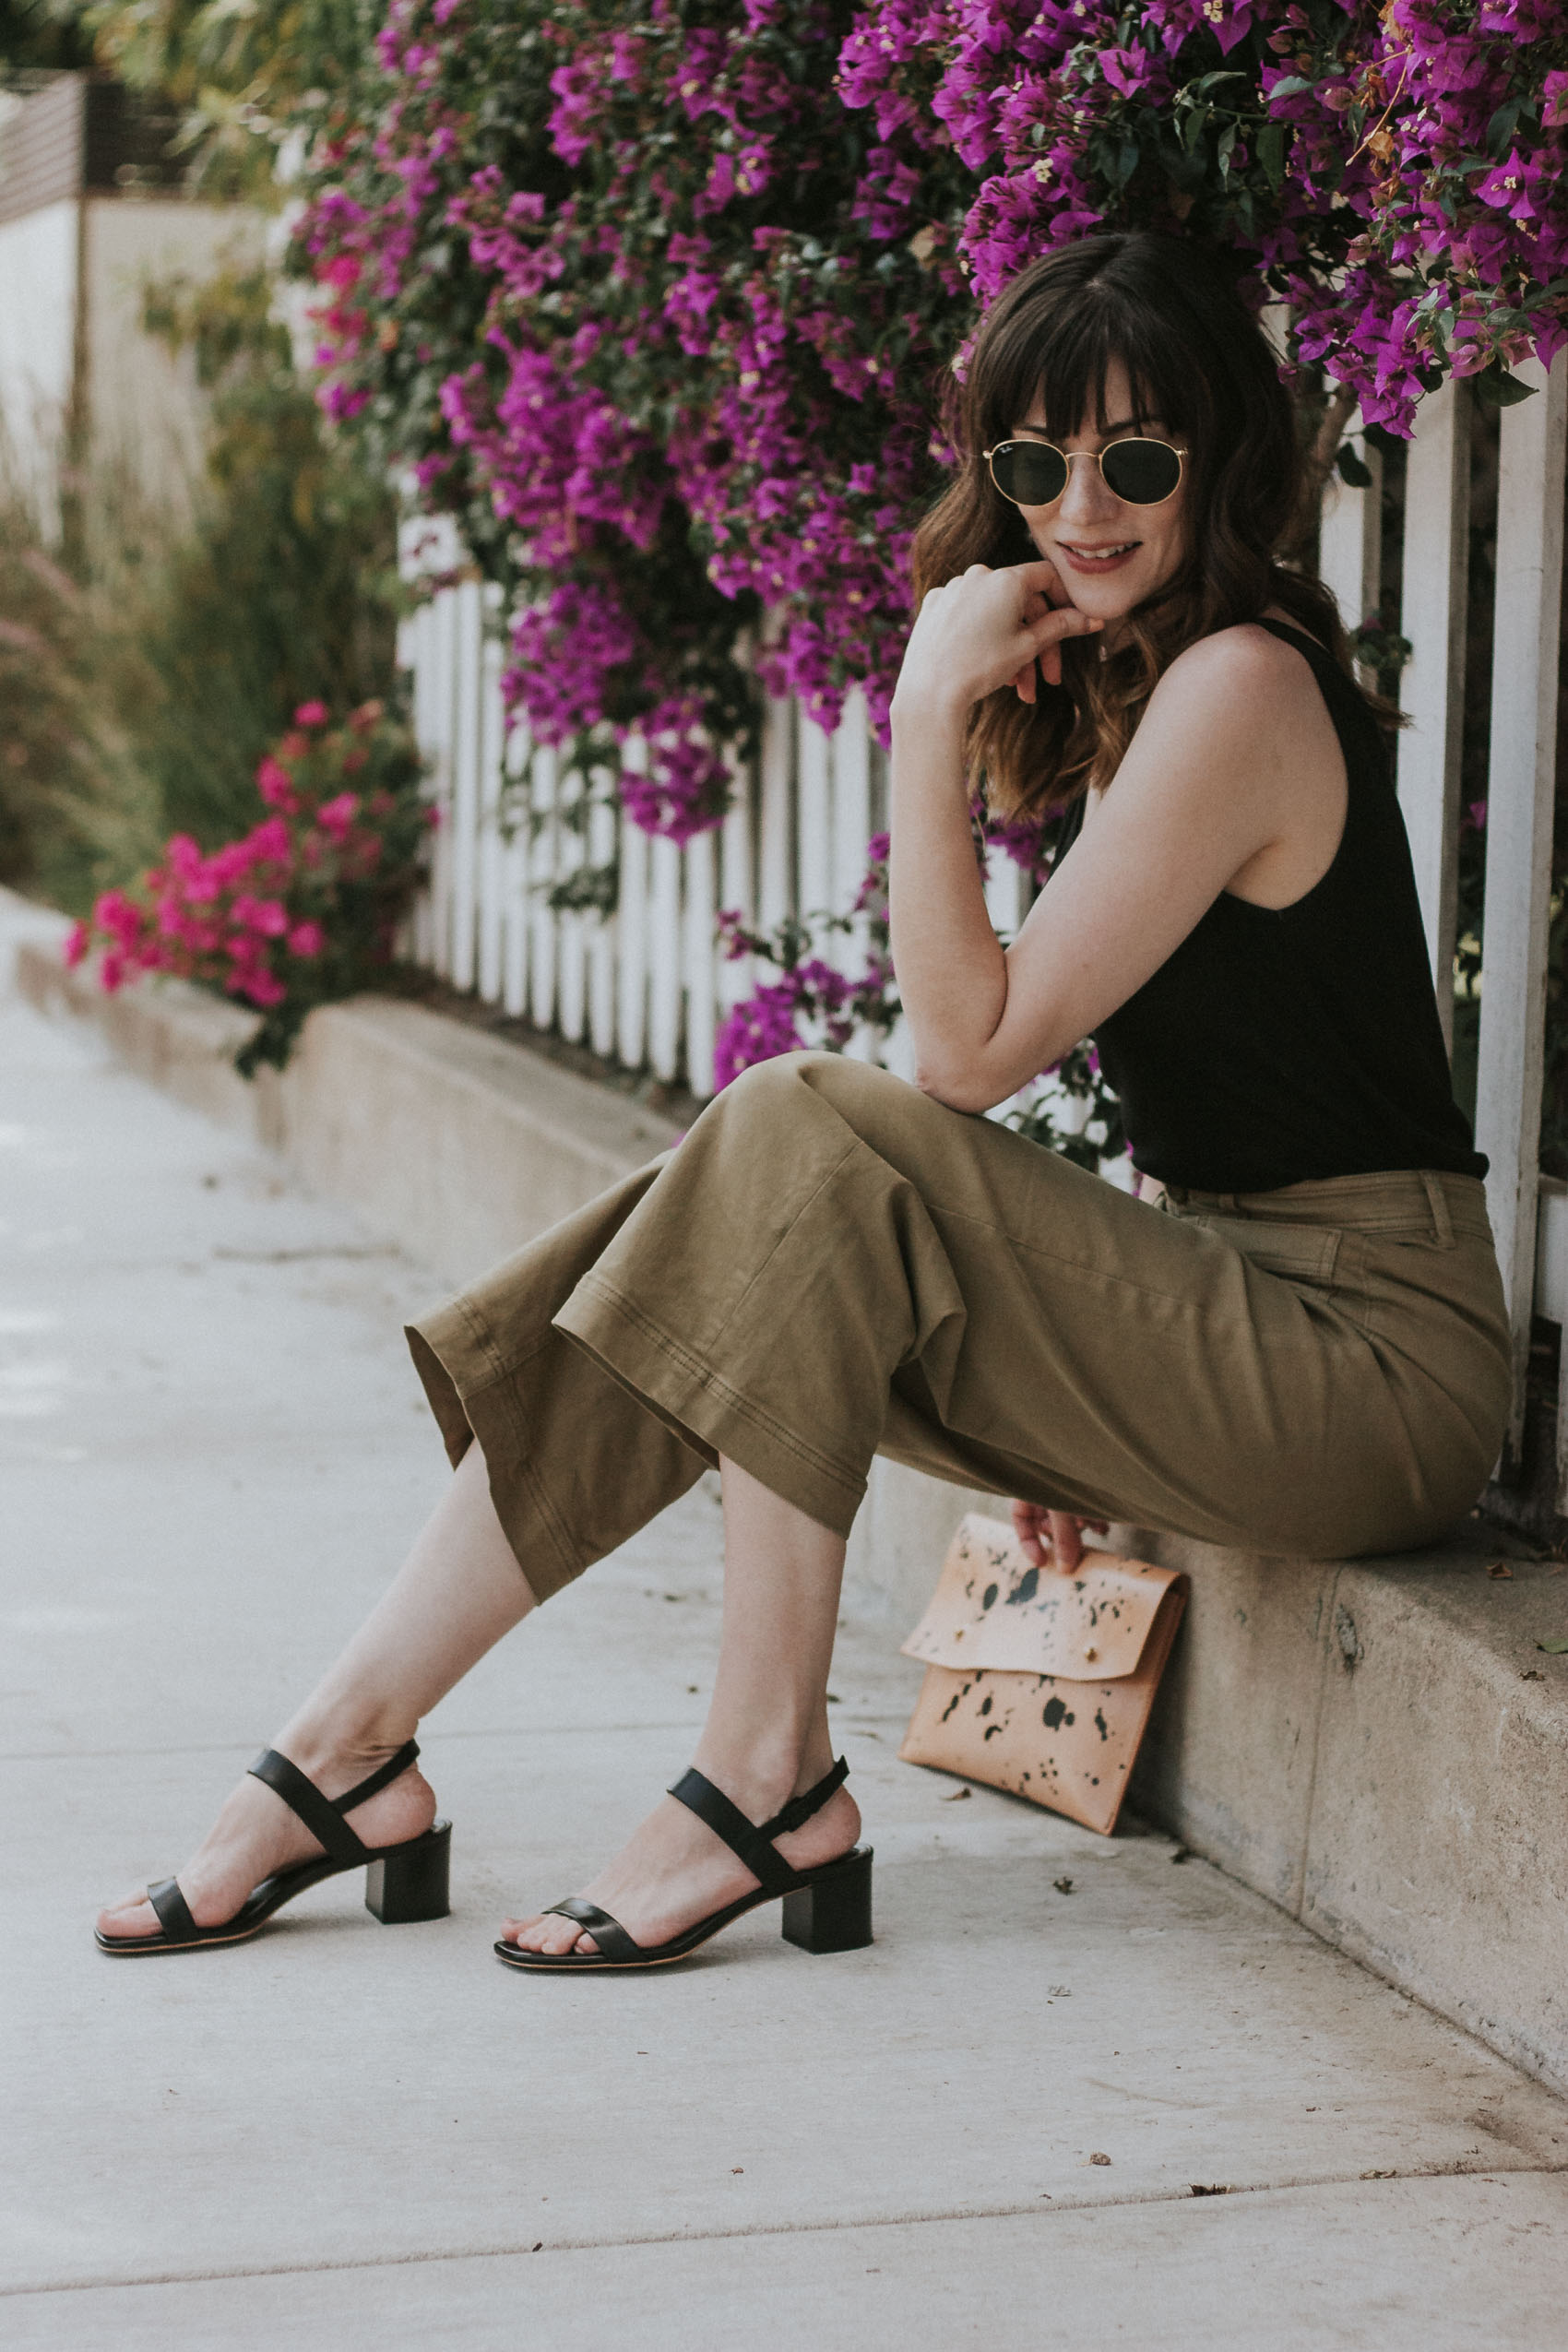 Los Angeles Blogger wearing Everlane Wide Leg Crop Pants and Block Heel Sandals